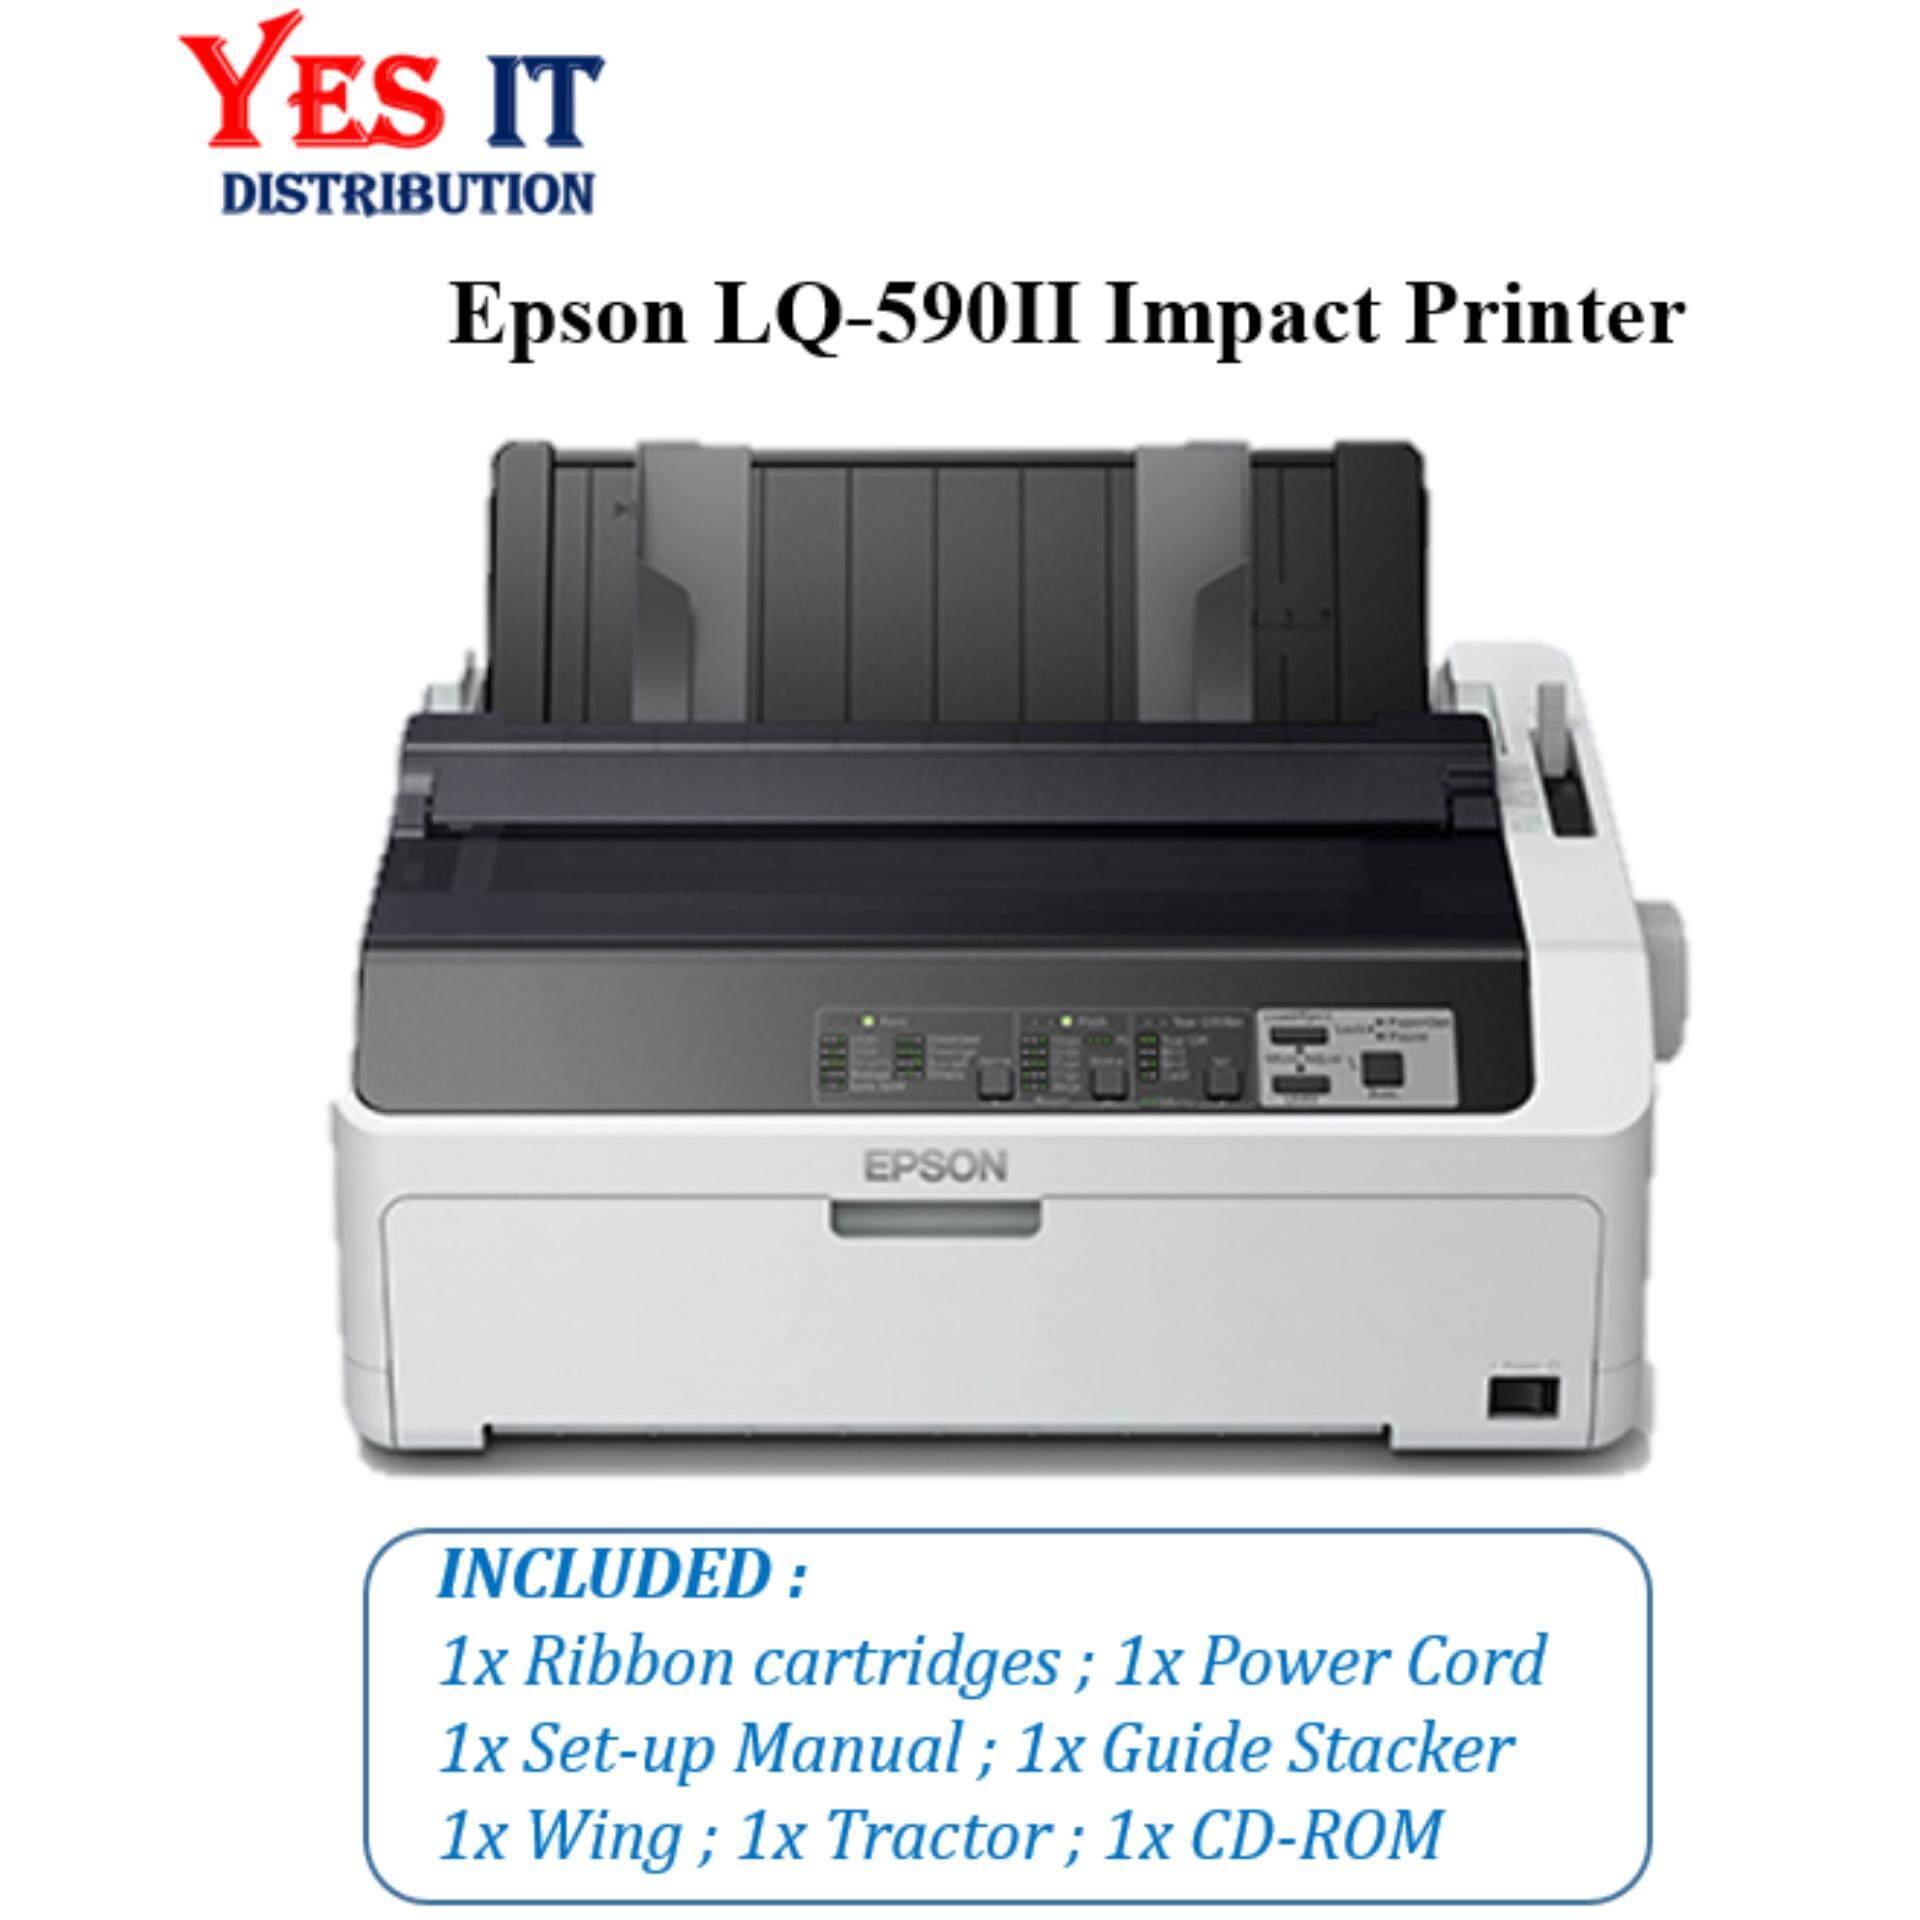 Epson Lq-590 Ii Impact Printer By Yes It Distribution.